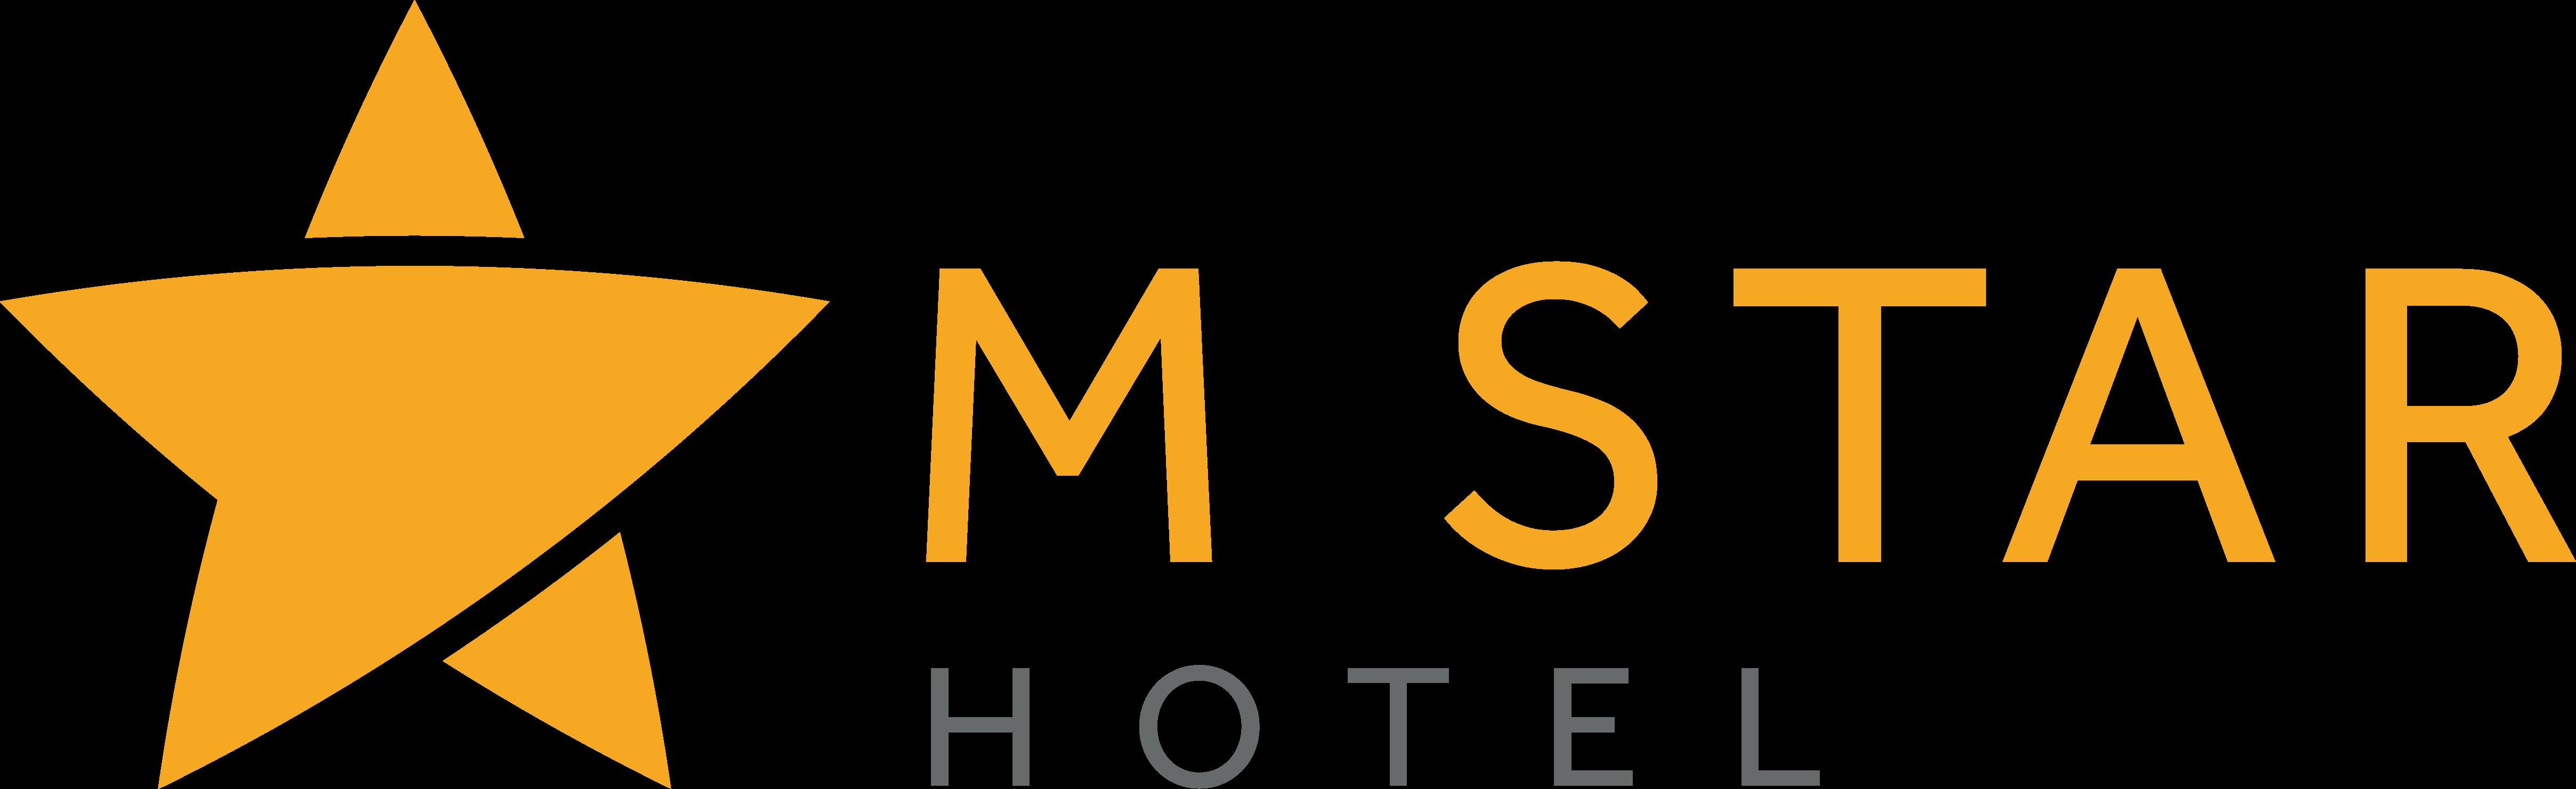 M Star Hotellogo;